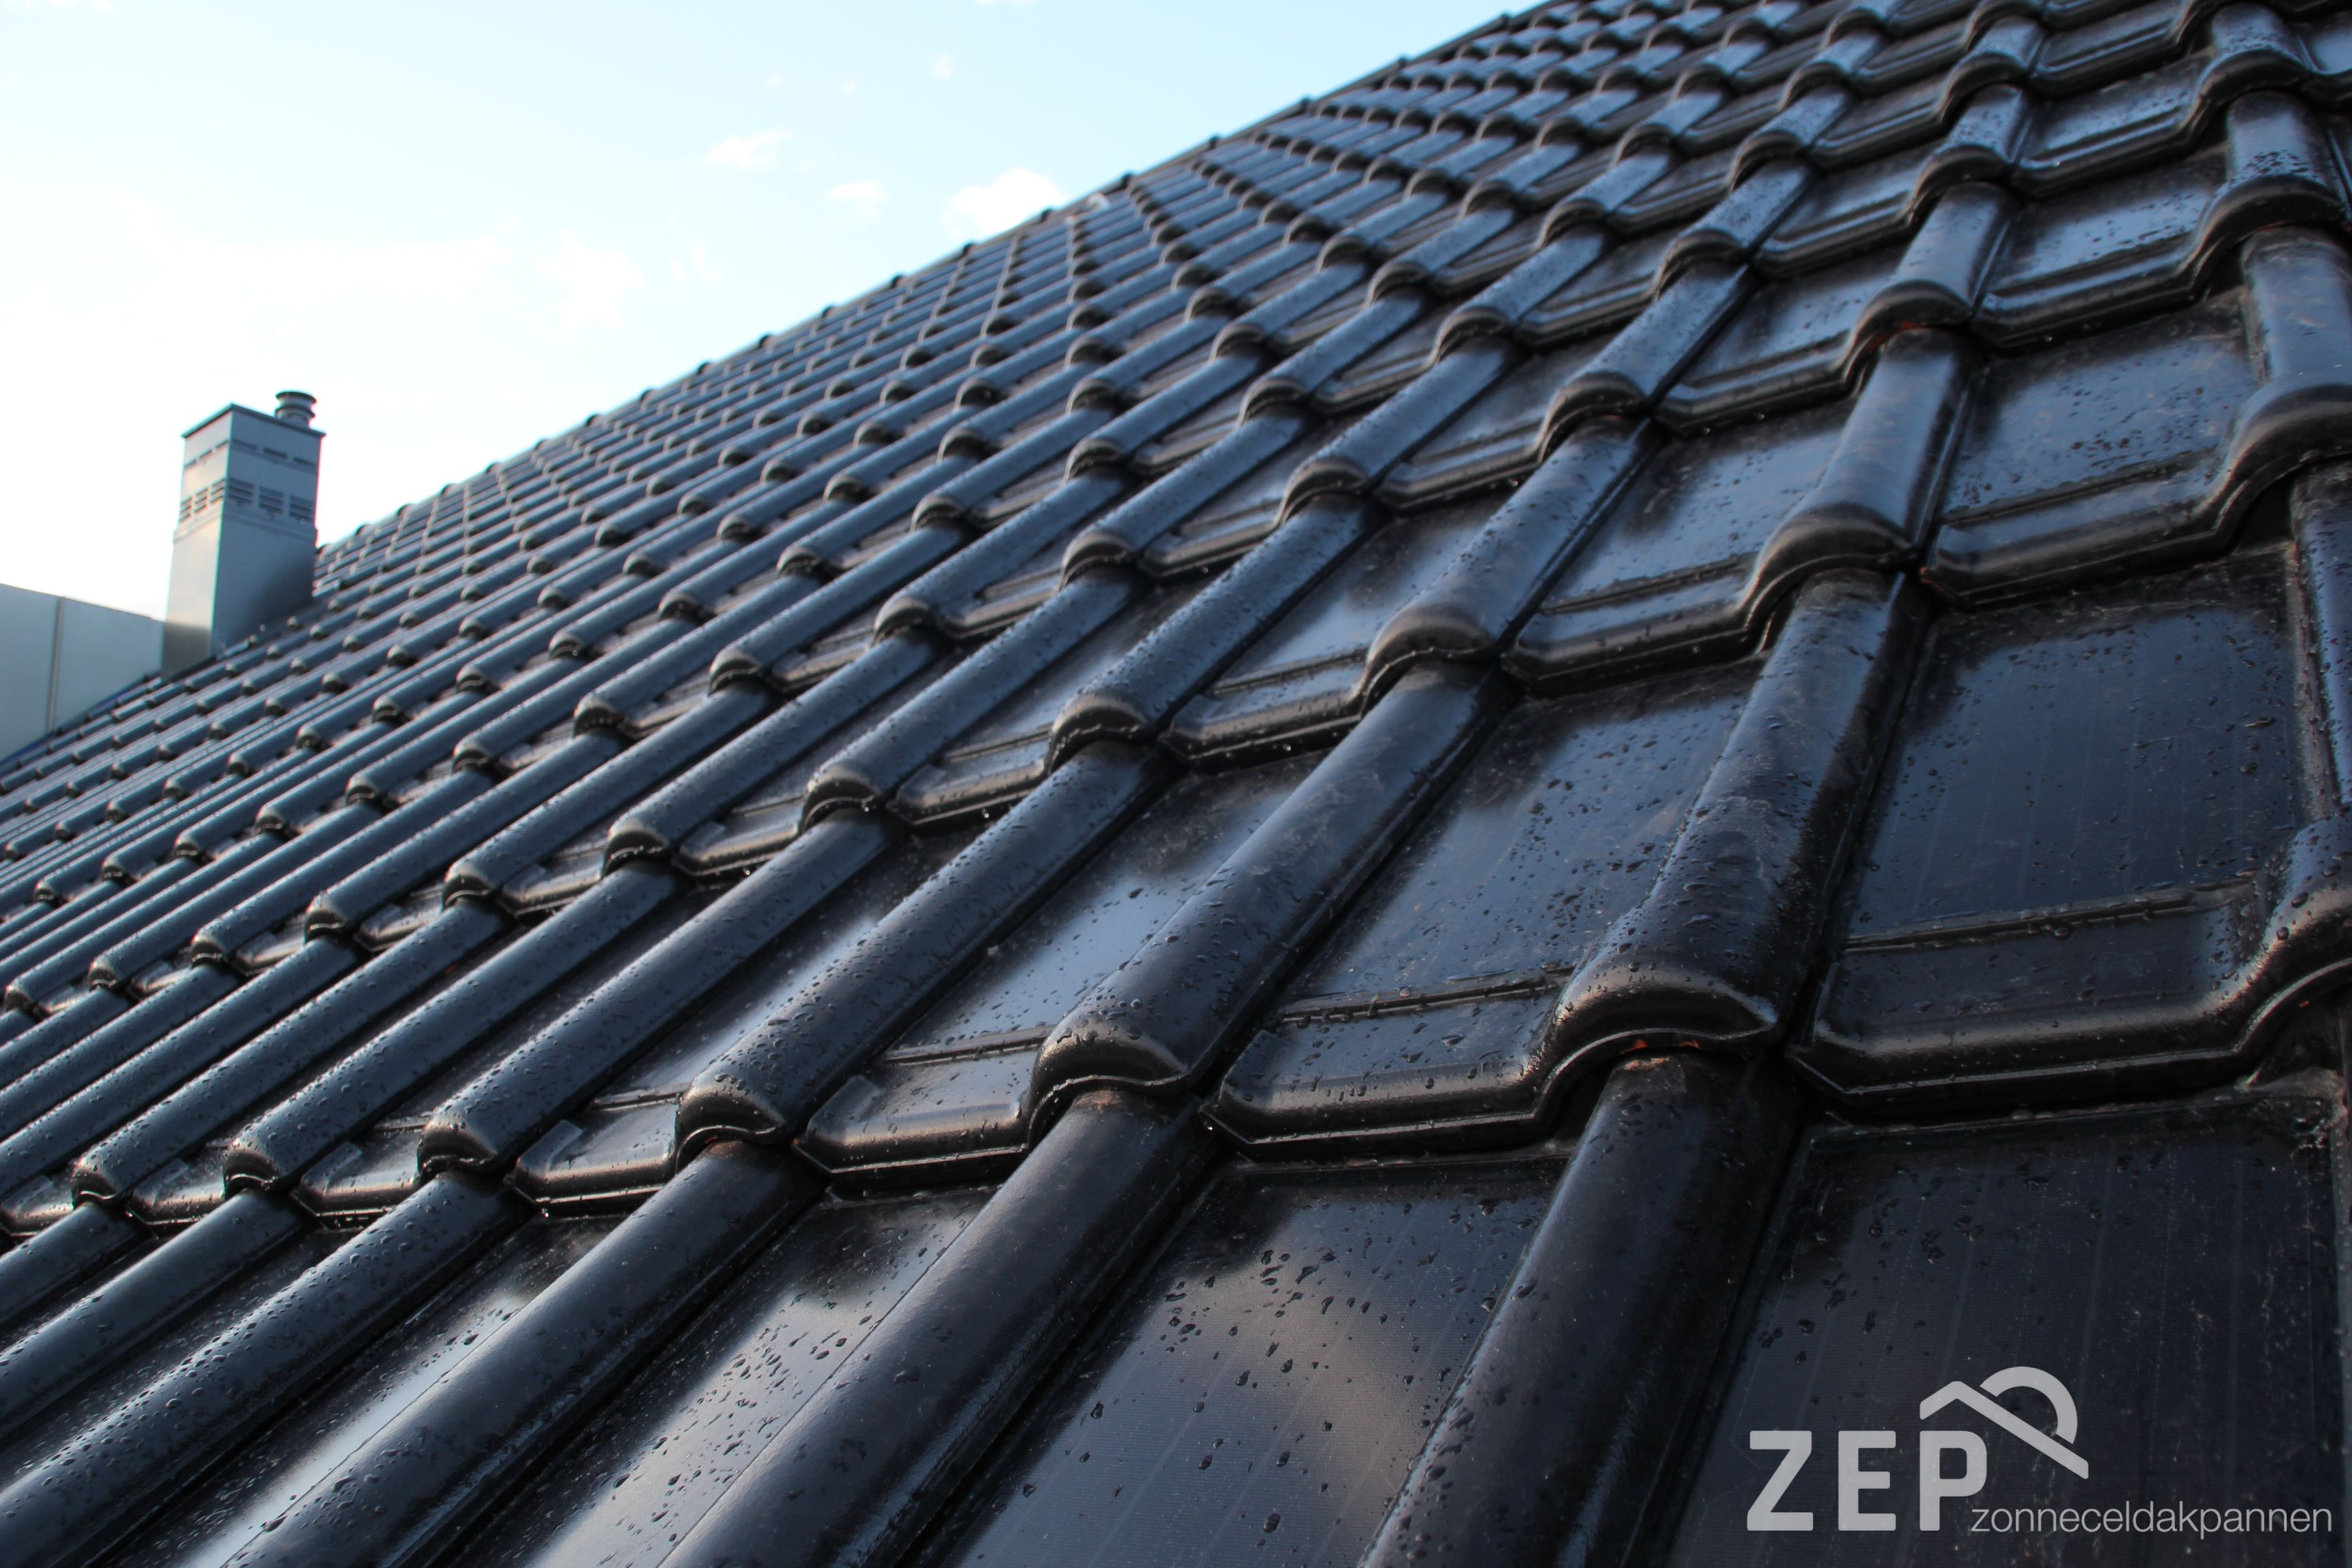 ZEP zonneceldakpannen - WoonwijzerwinkelWoonwijzerwinkel